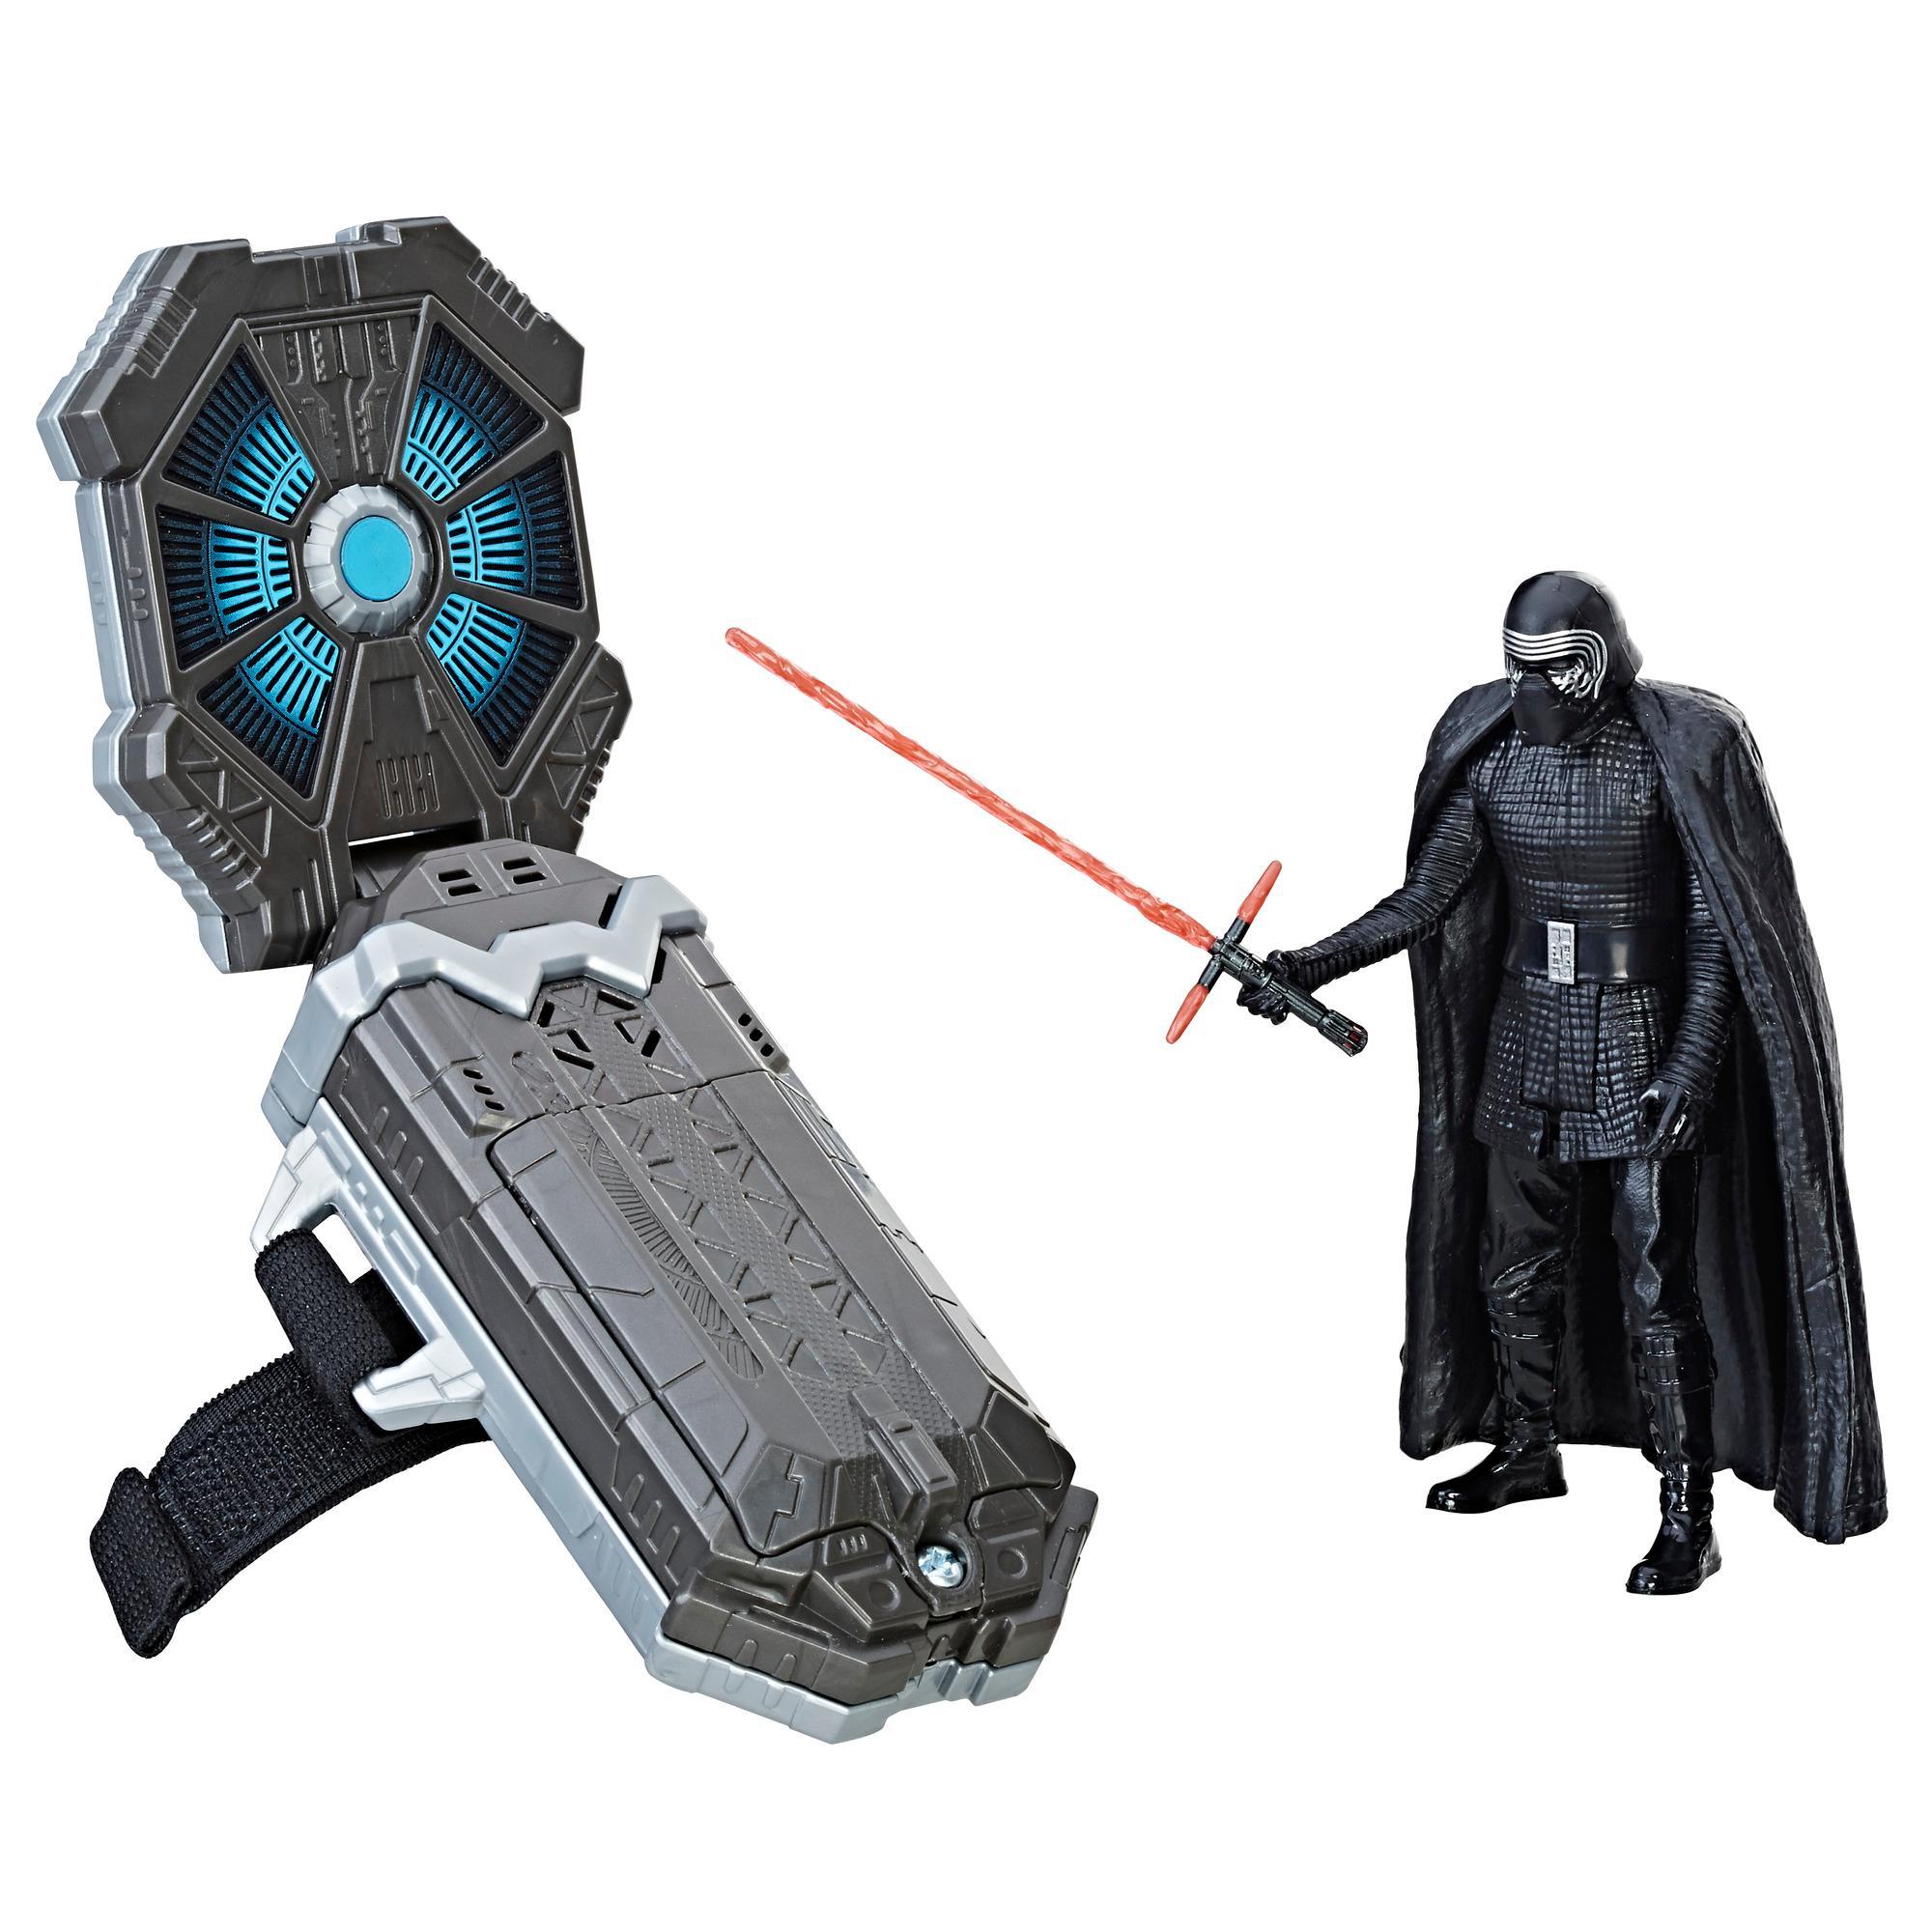 Star Wars Force Link Başlangıç Seti